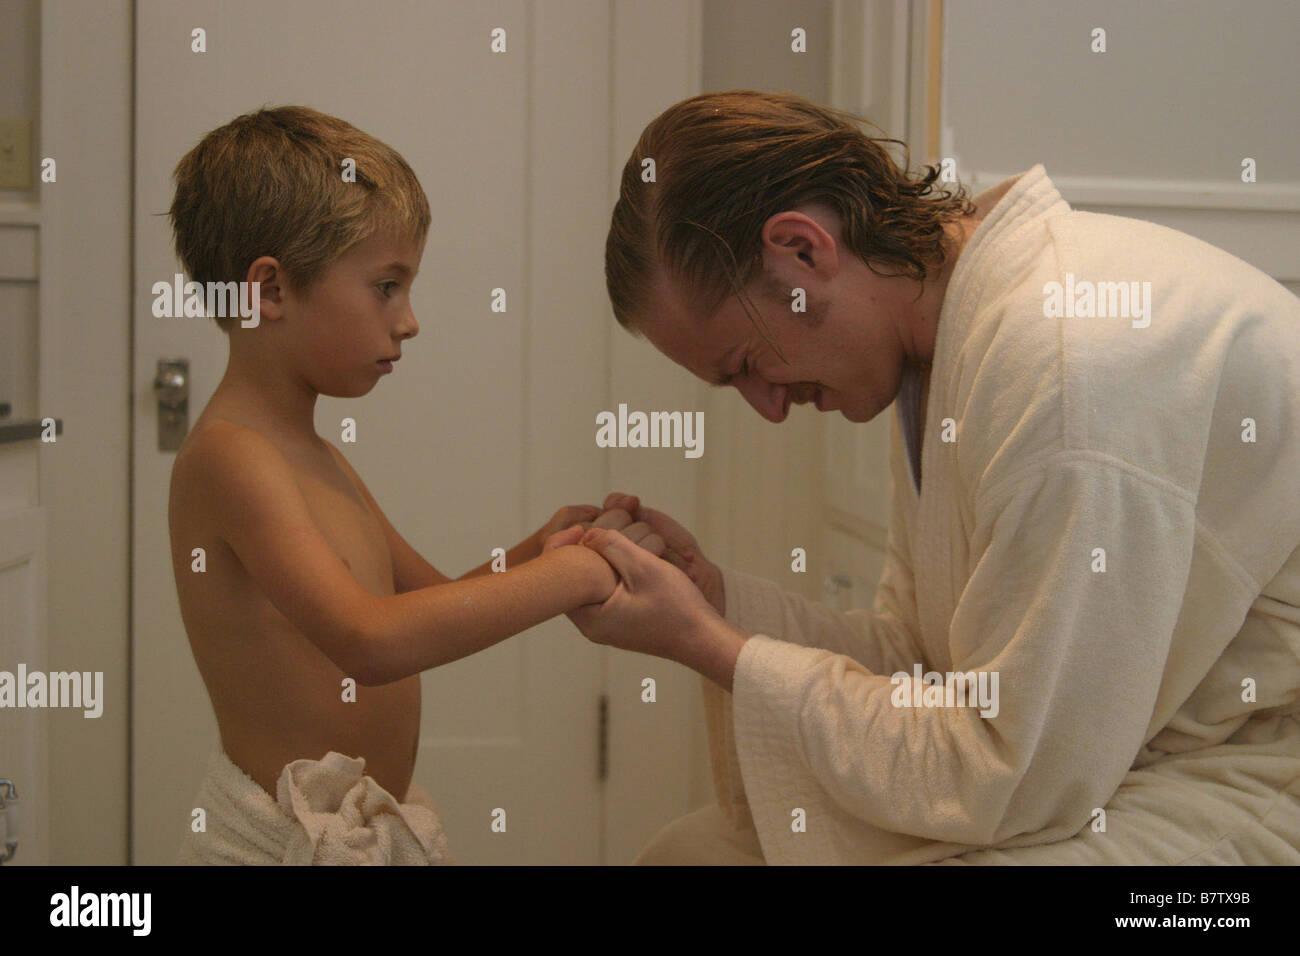 LE LIVRE DE JEREMIE The Heart Is Deceitful Above All Things  2004 - uk usa Jimmy Bennett, Jeremy Renner realisateur - Stock Image